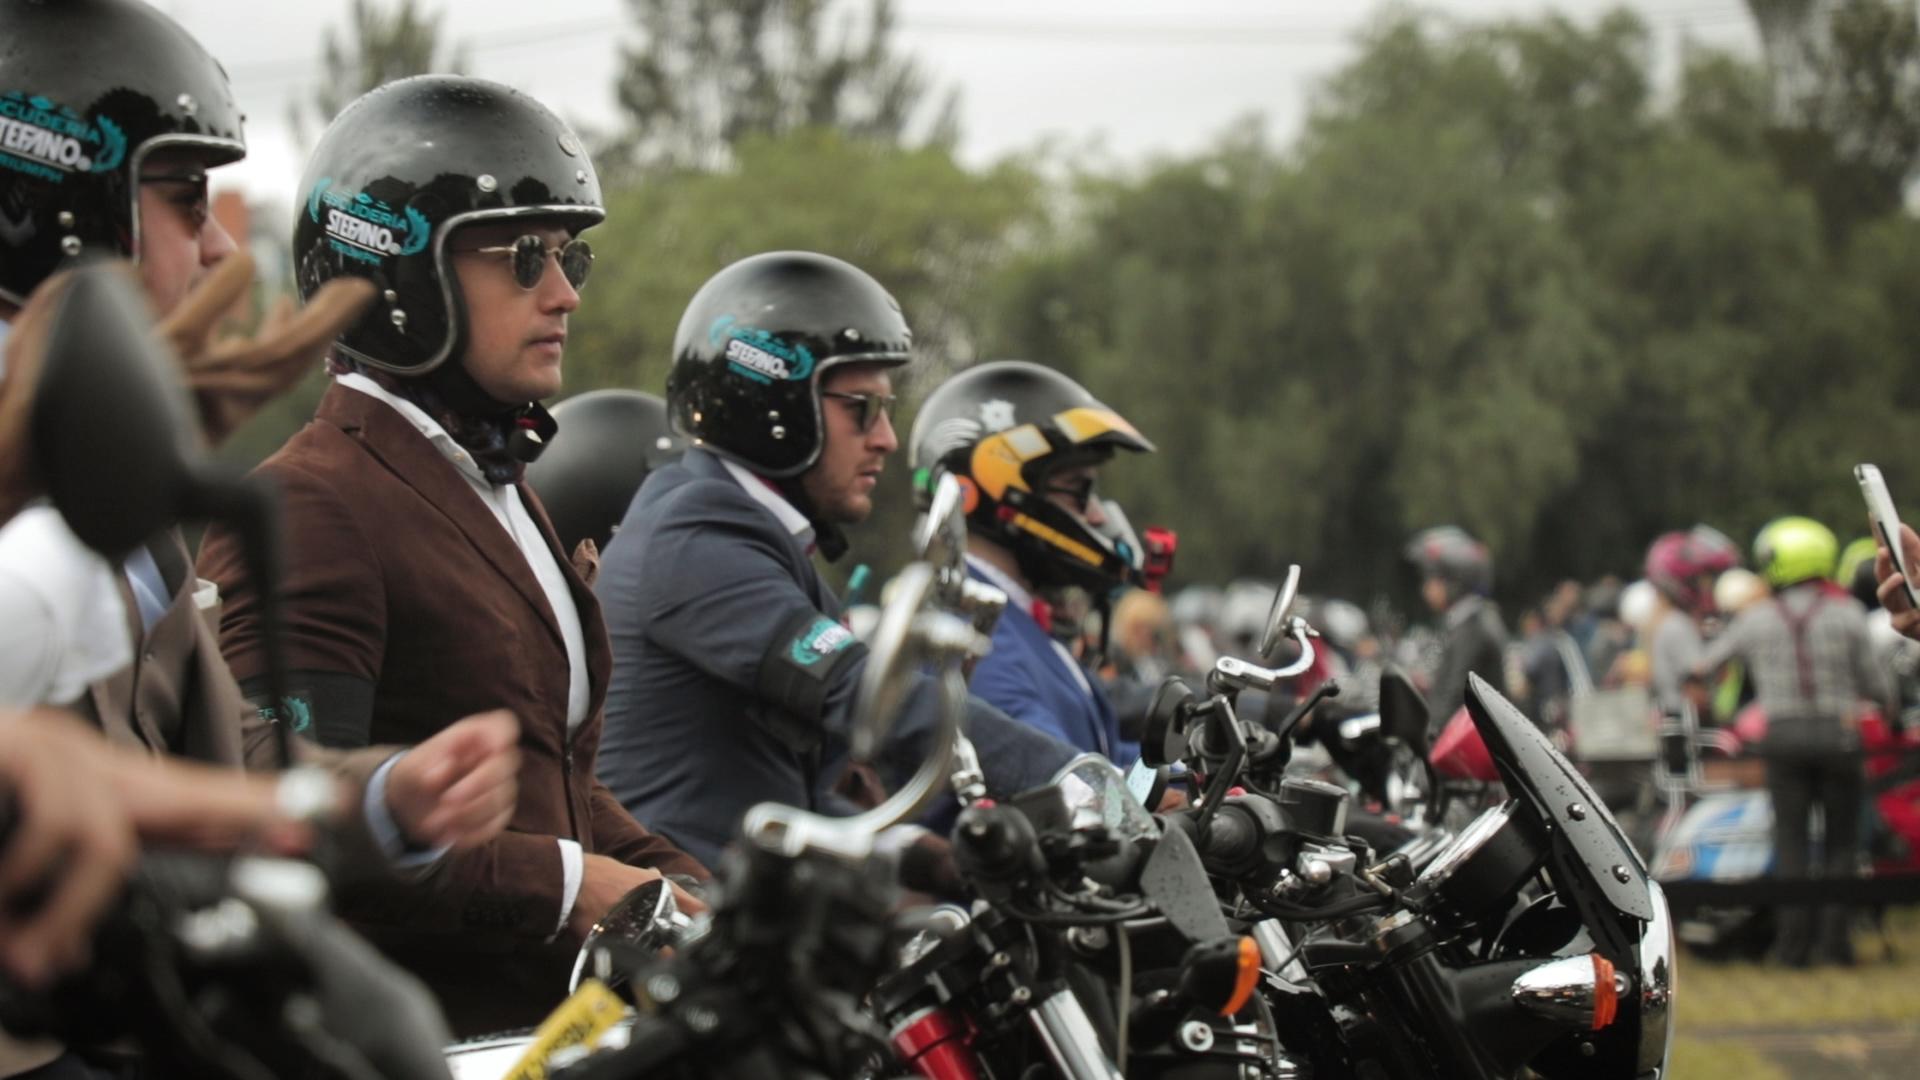 The Distinguished Gentleman's Ride 02